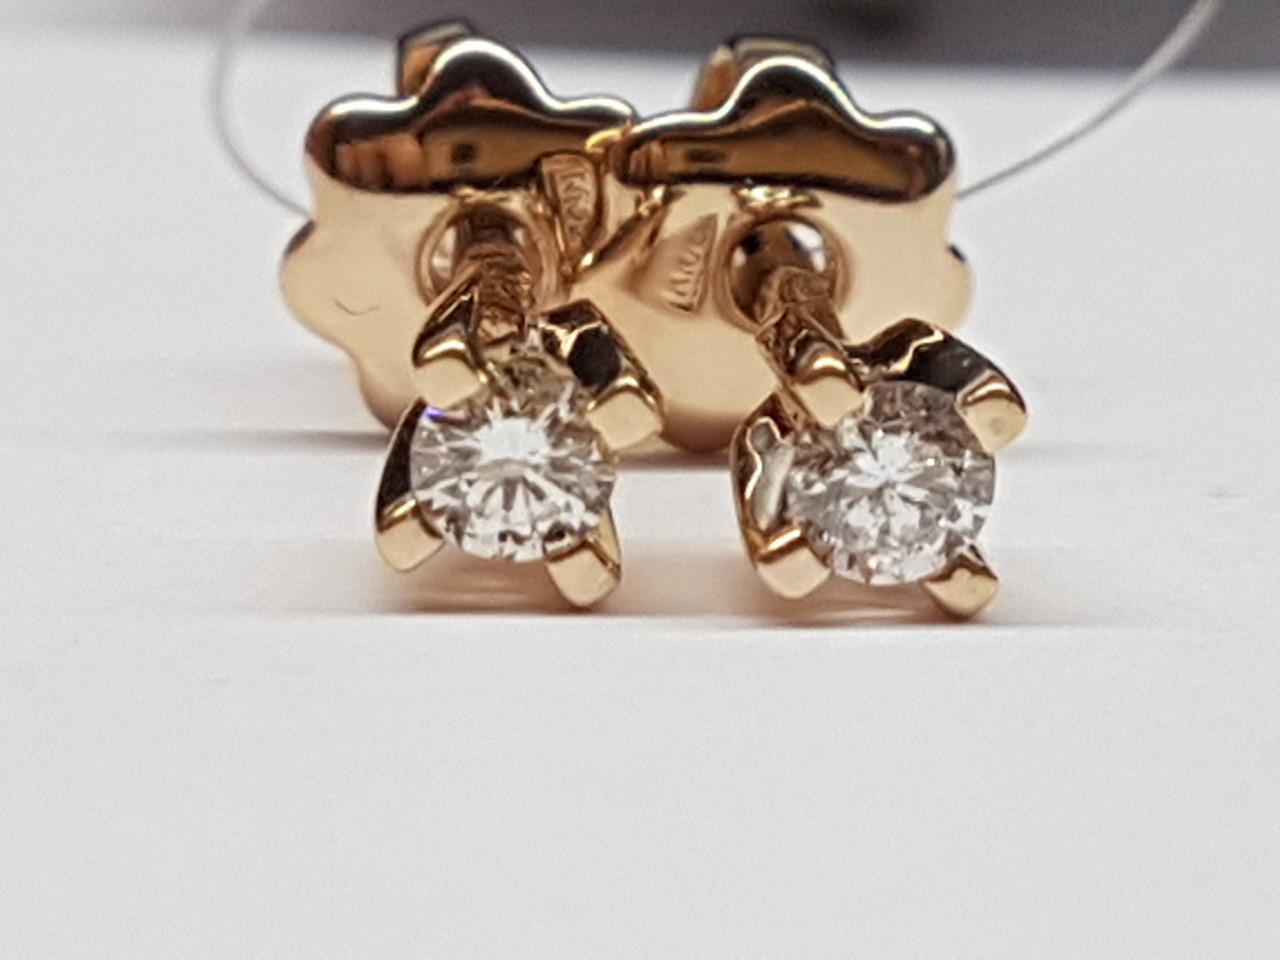 Золотые серьги с бриллиантами. Артикул 502-00789